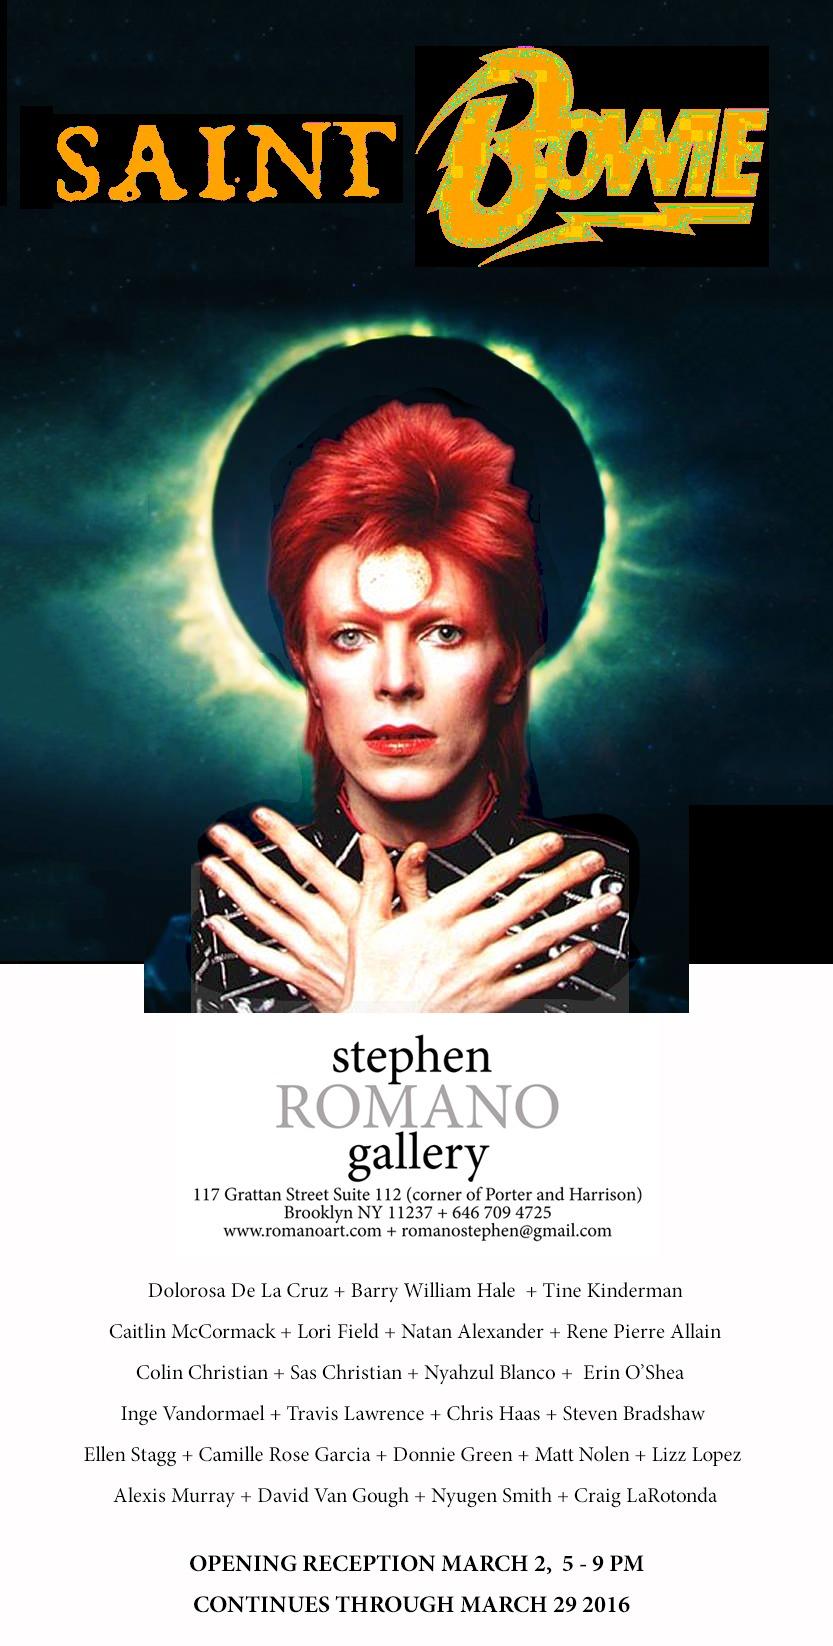 Saint Bowie - Stephen Romano Gallery